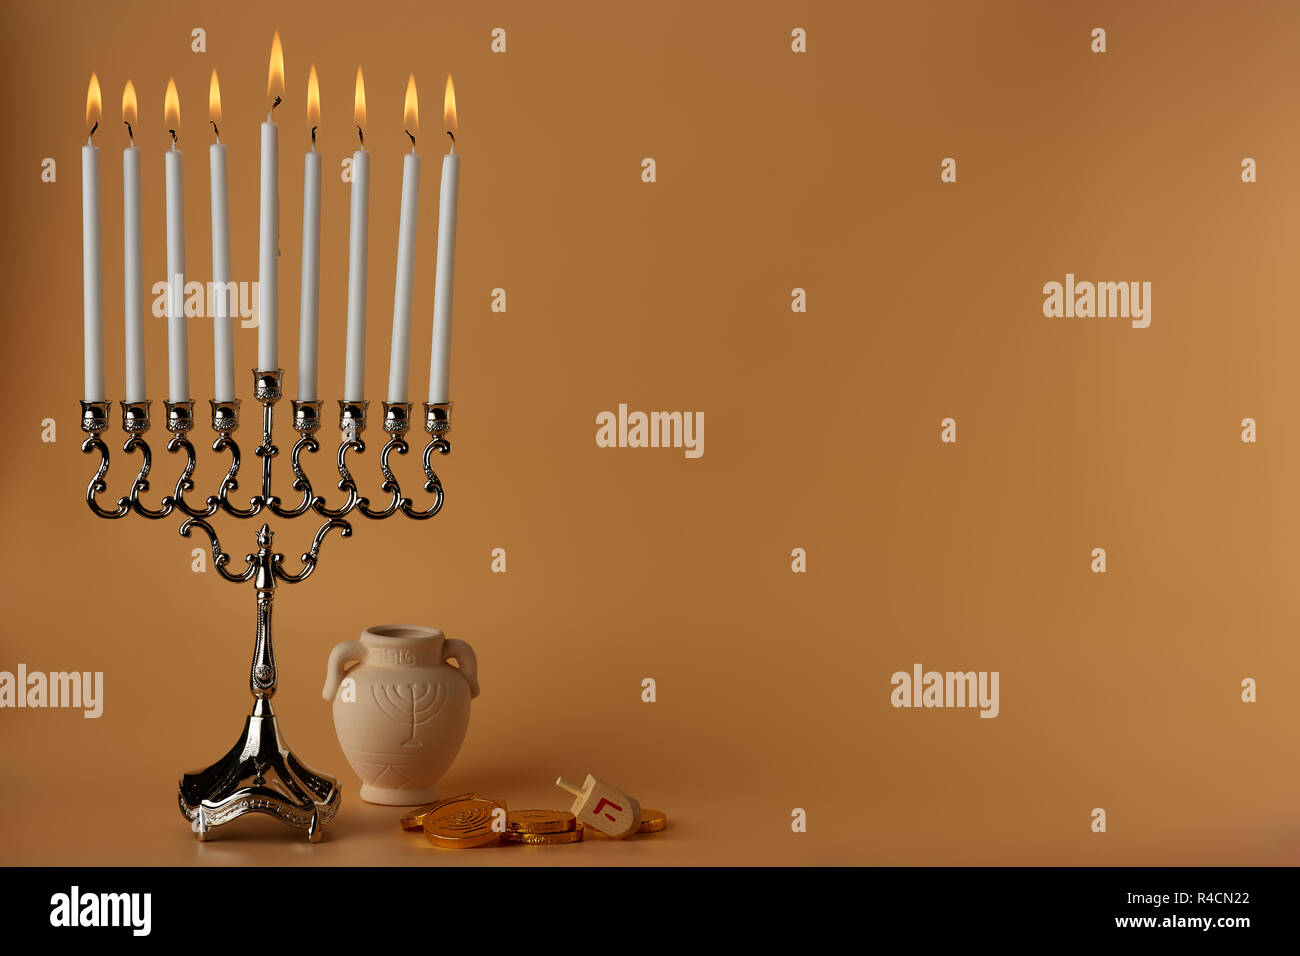 Composed lit menorah for Hanukkah celebration - Stock Image